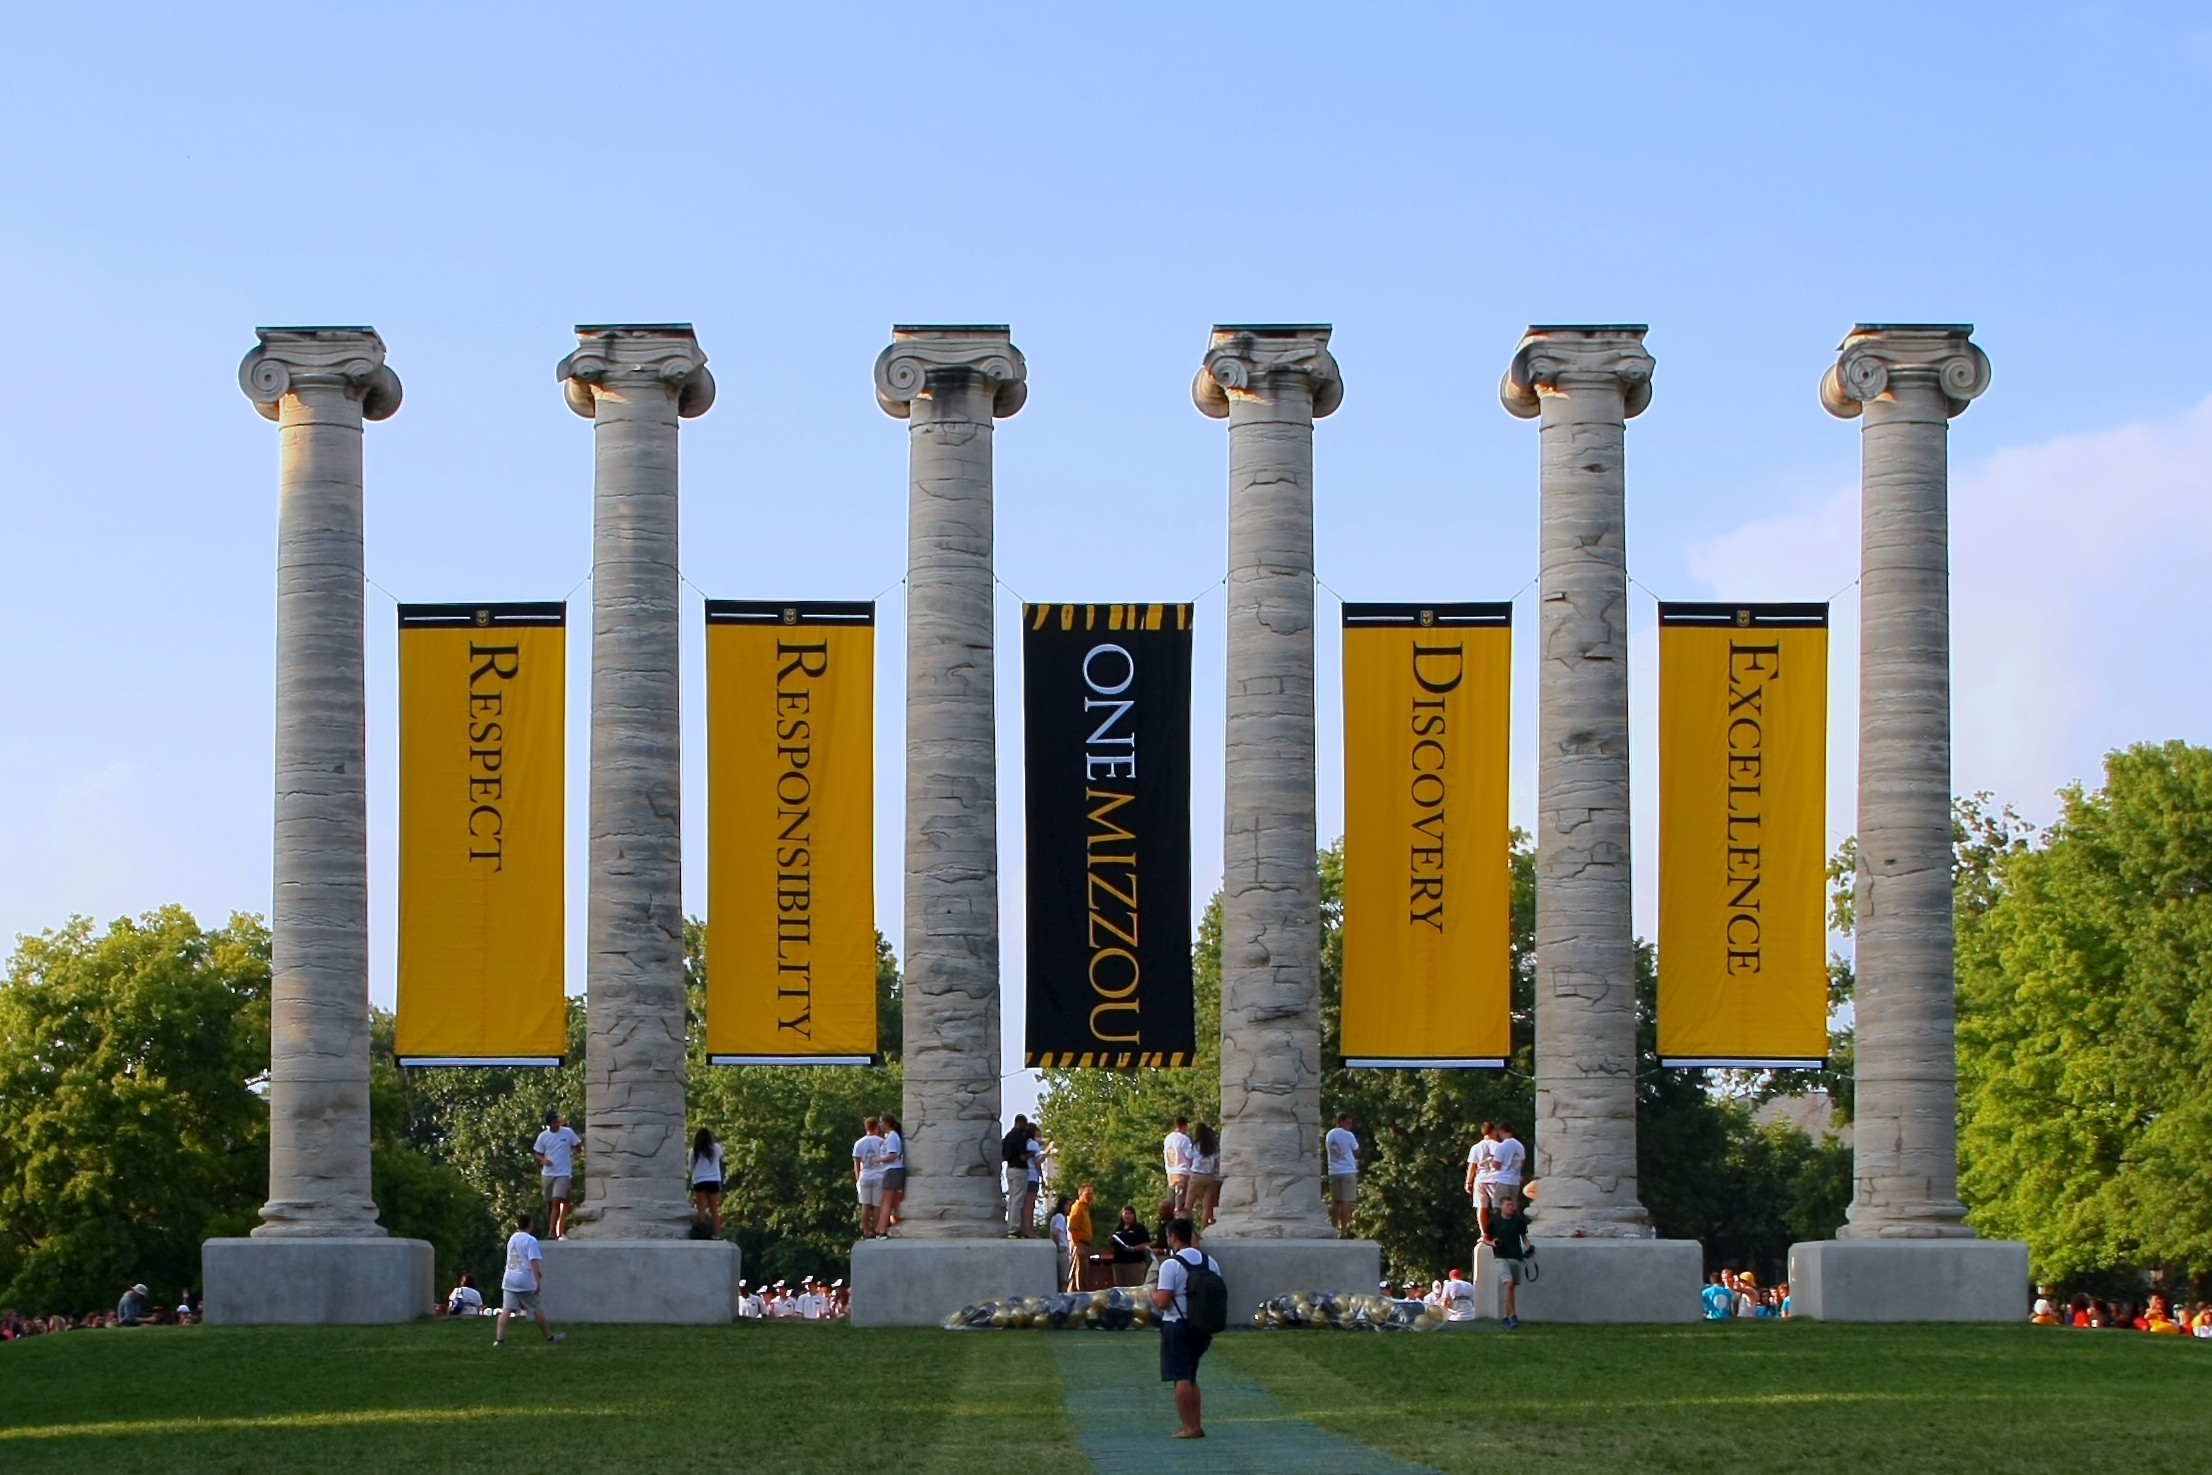 Update: University of Missouri Graduate Program Will